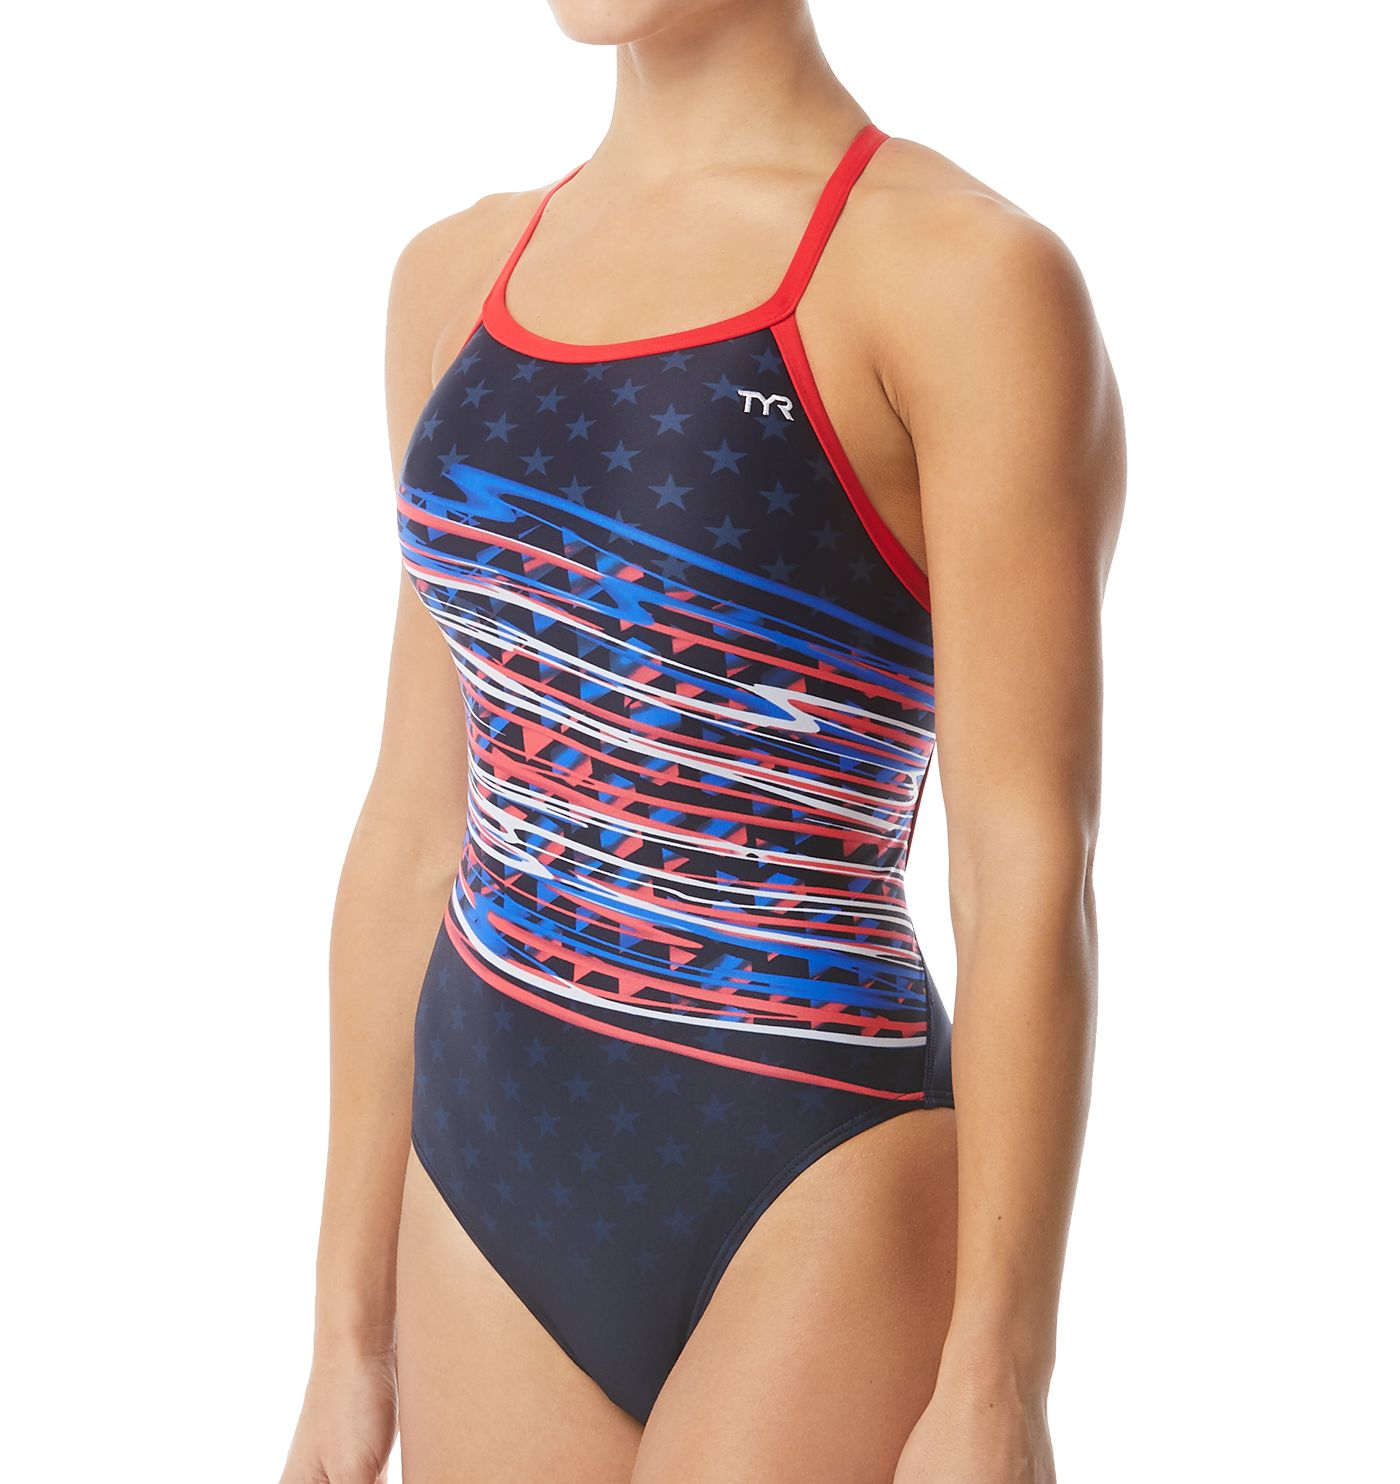 TYR Women's Victorious Diamondfit One Piece Swimsuit